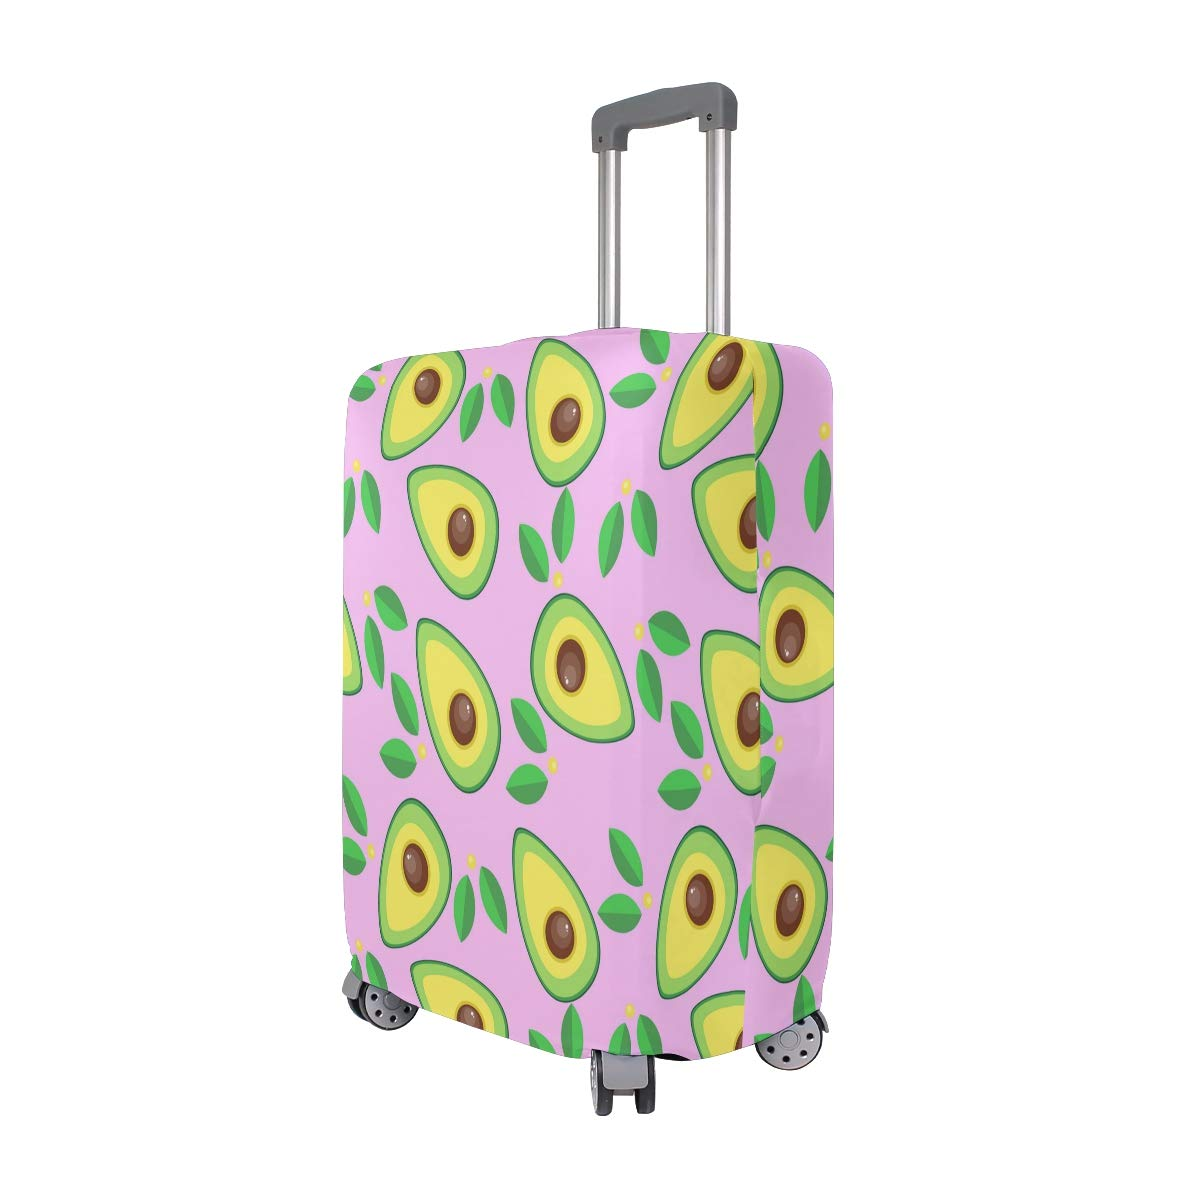 VIKKO Cartoon Avocado Travel Luggage Cover Suitcase Cover Protector Travel Case Bag Protector Elastic Luggage Case Cover Fits 29-32 Inch Luggage for Kids Men Women Travel